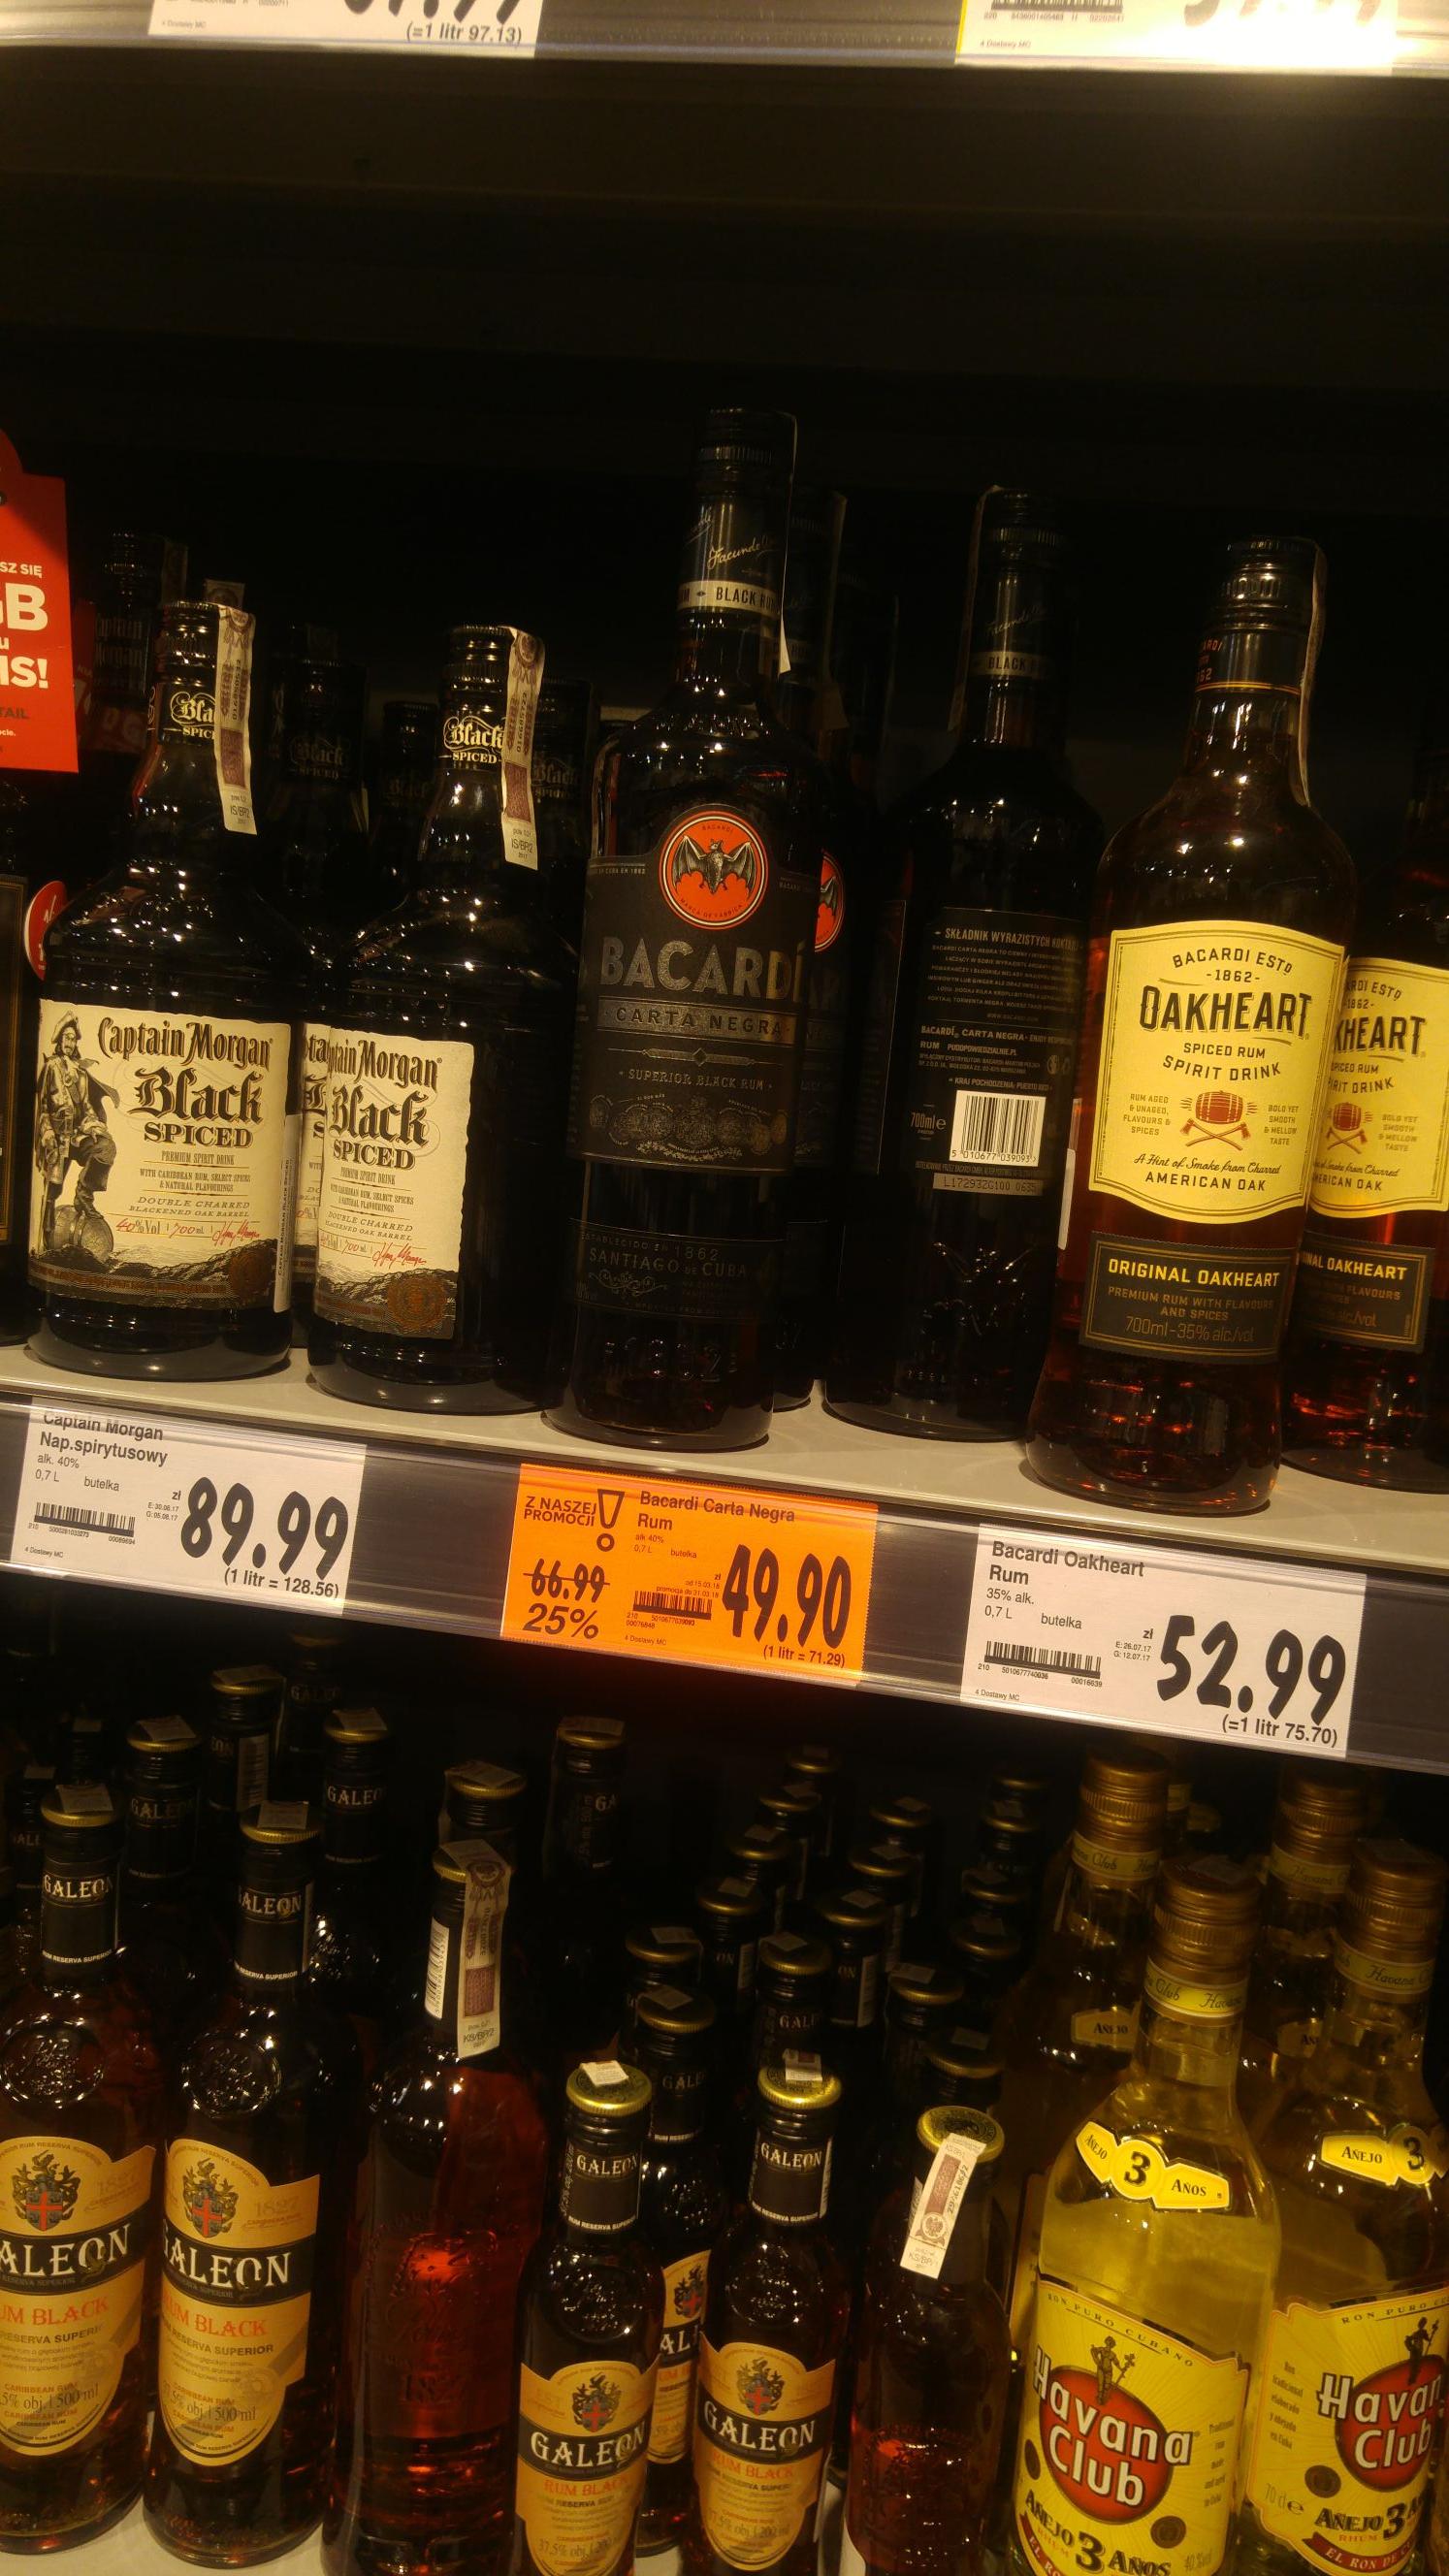 Rum Bacardi carta negra 0.7 Kaufland